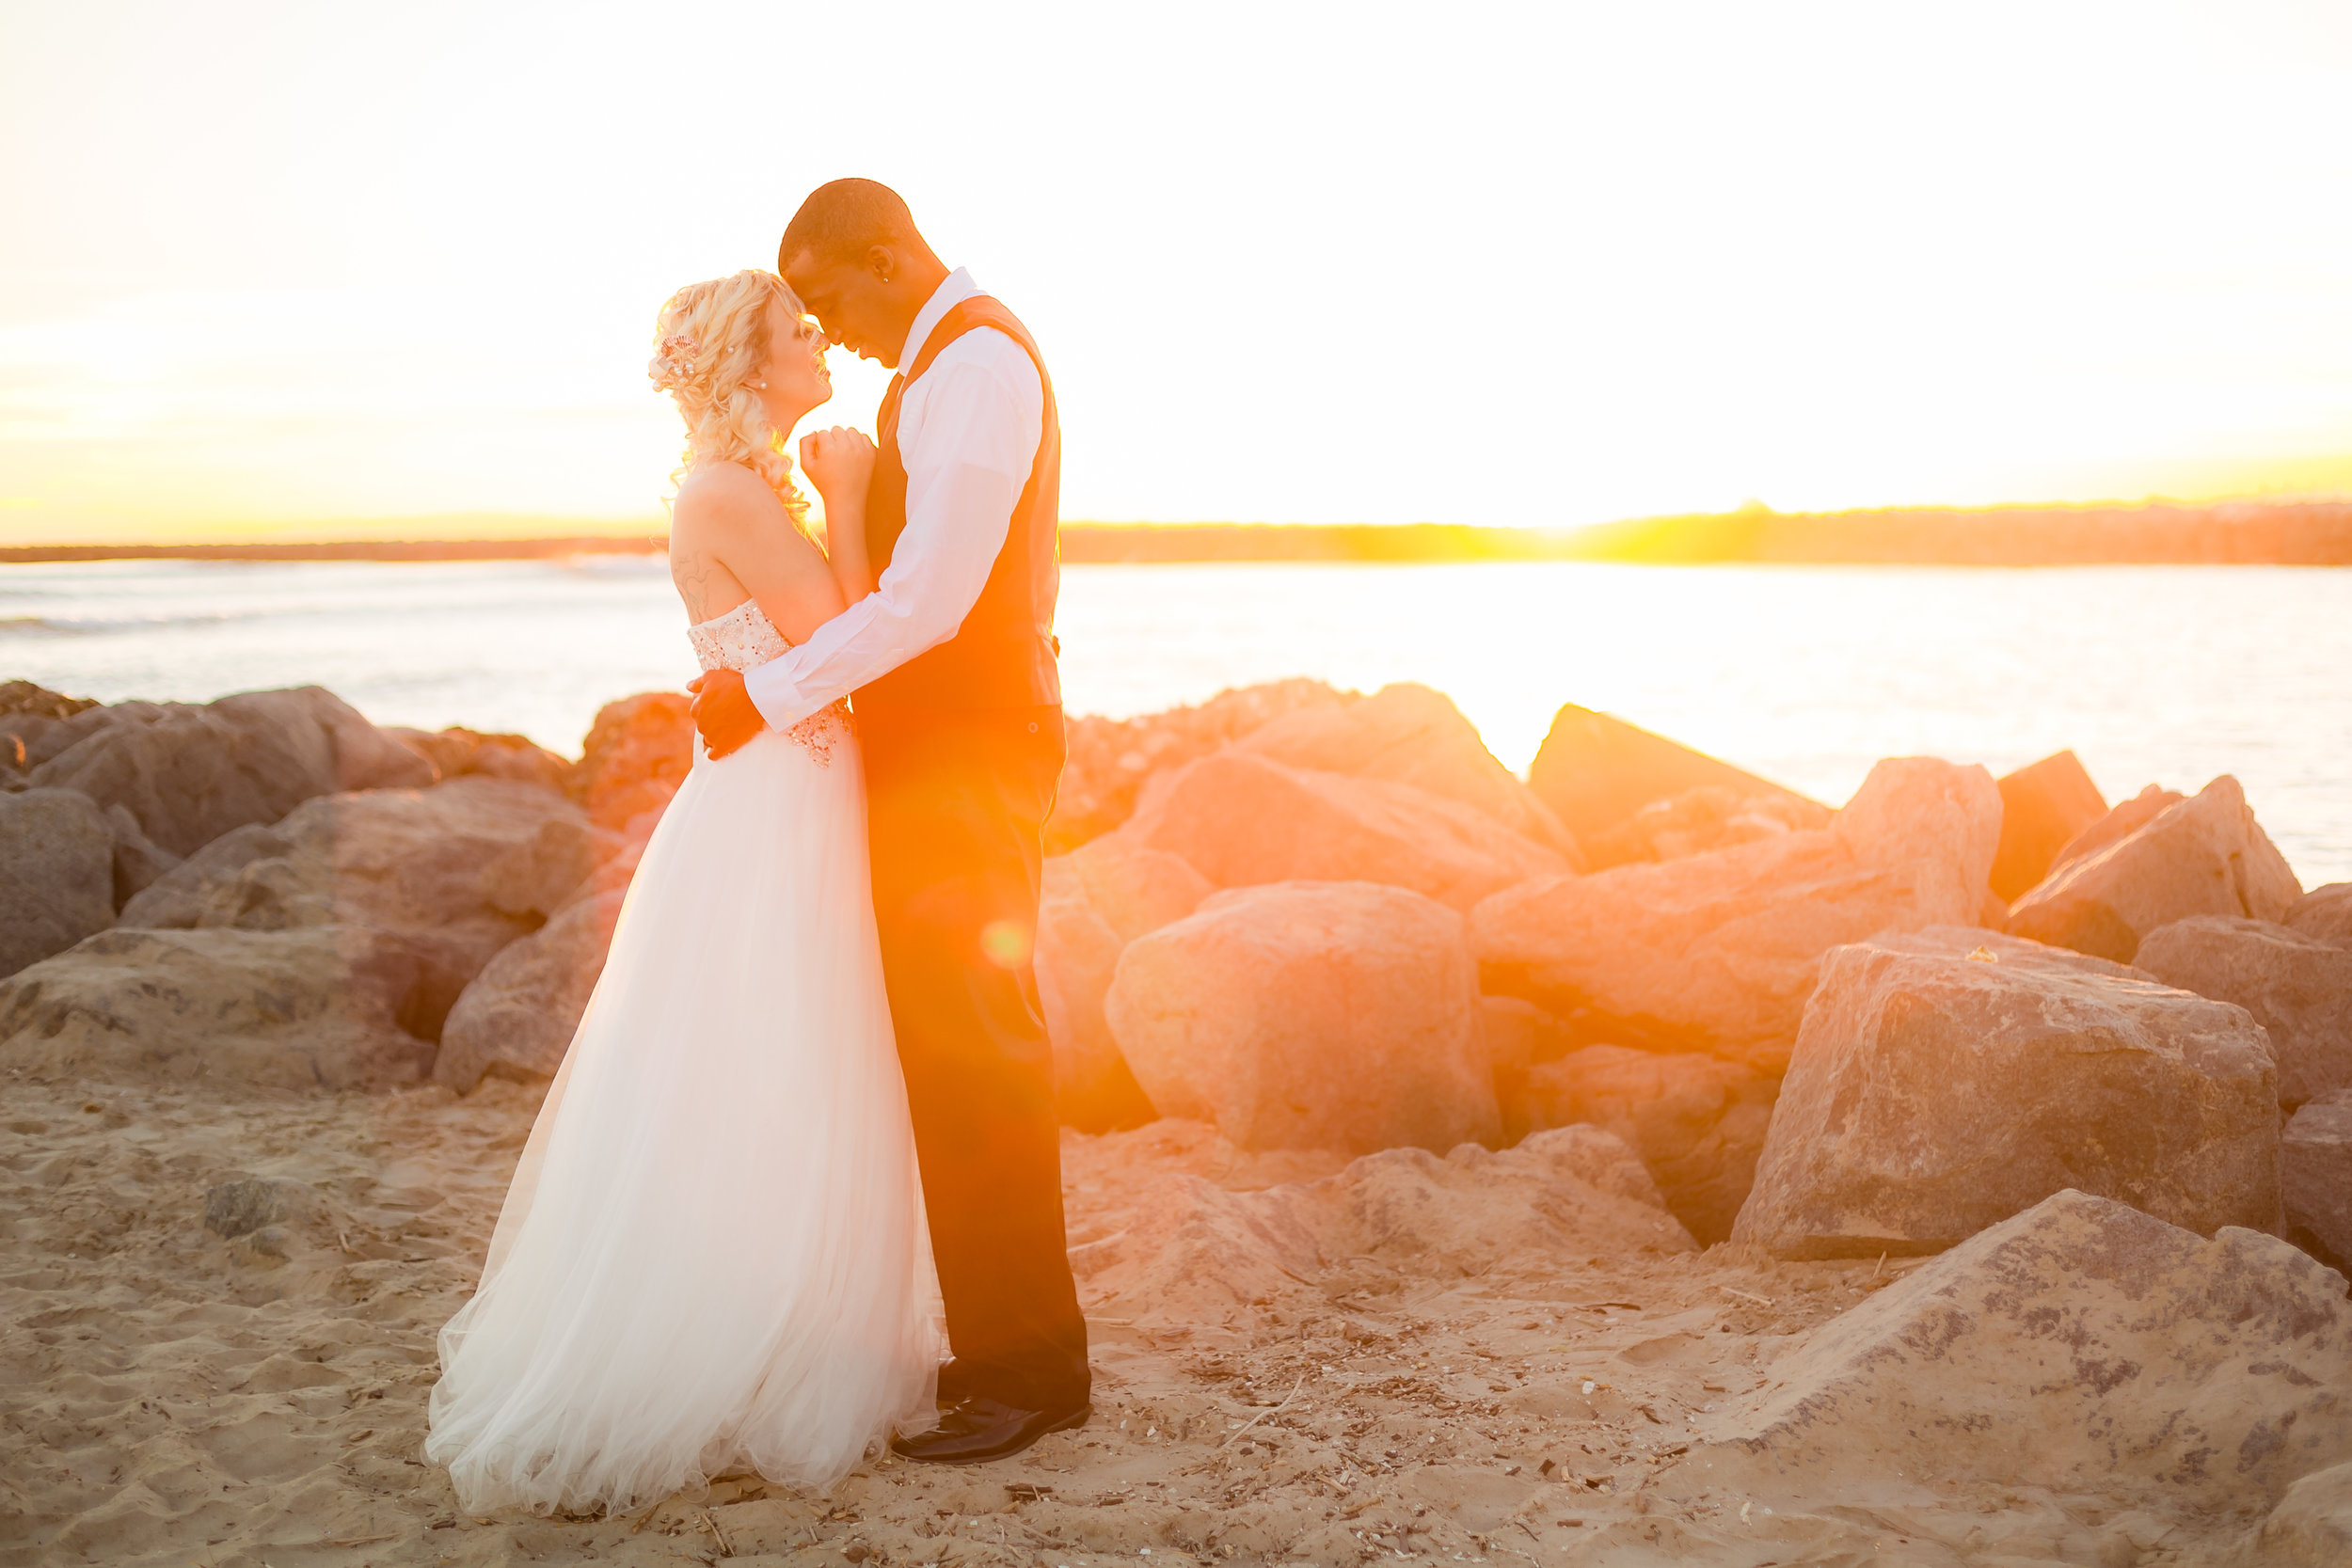 Orange_County_Lifestyle_Wedding_George-9762.jpg